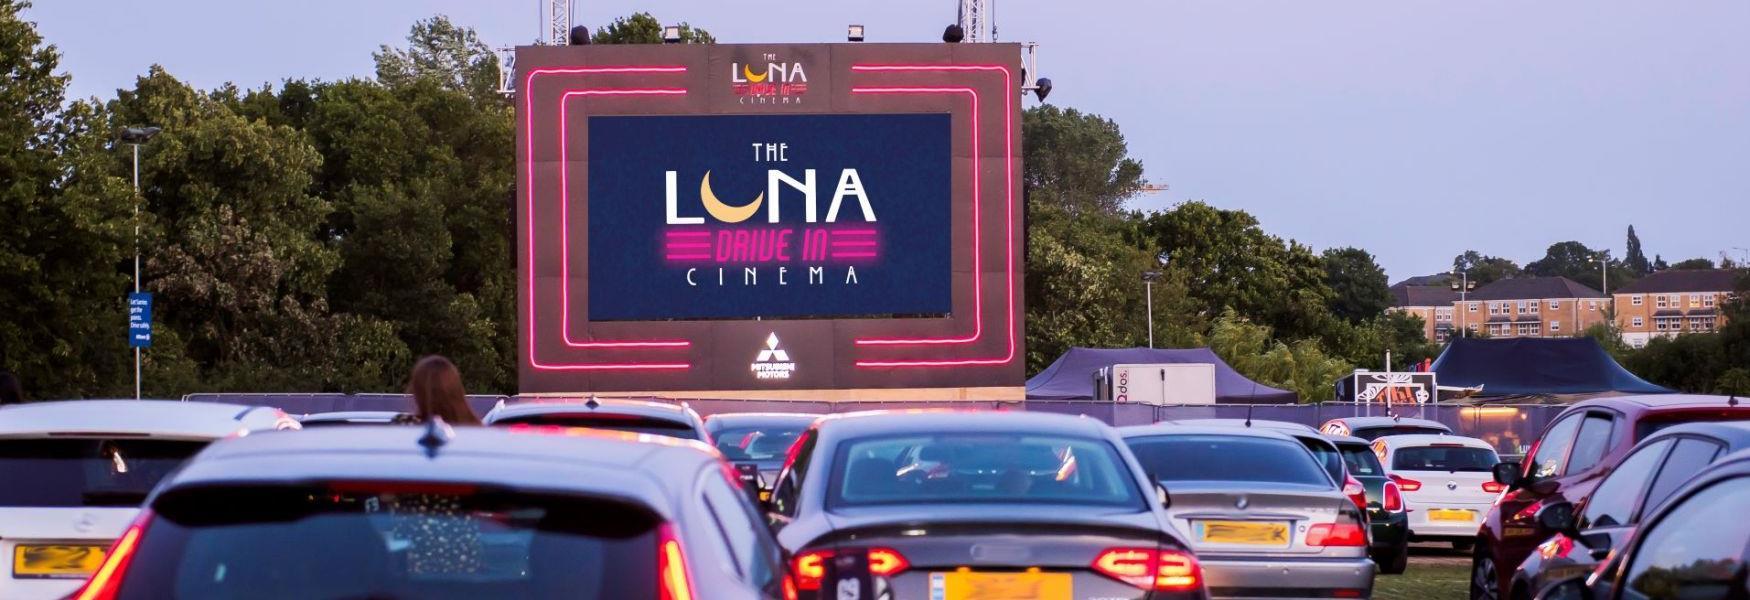 Luna Drive In Cinema at Ascot Racecourse